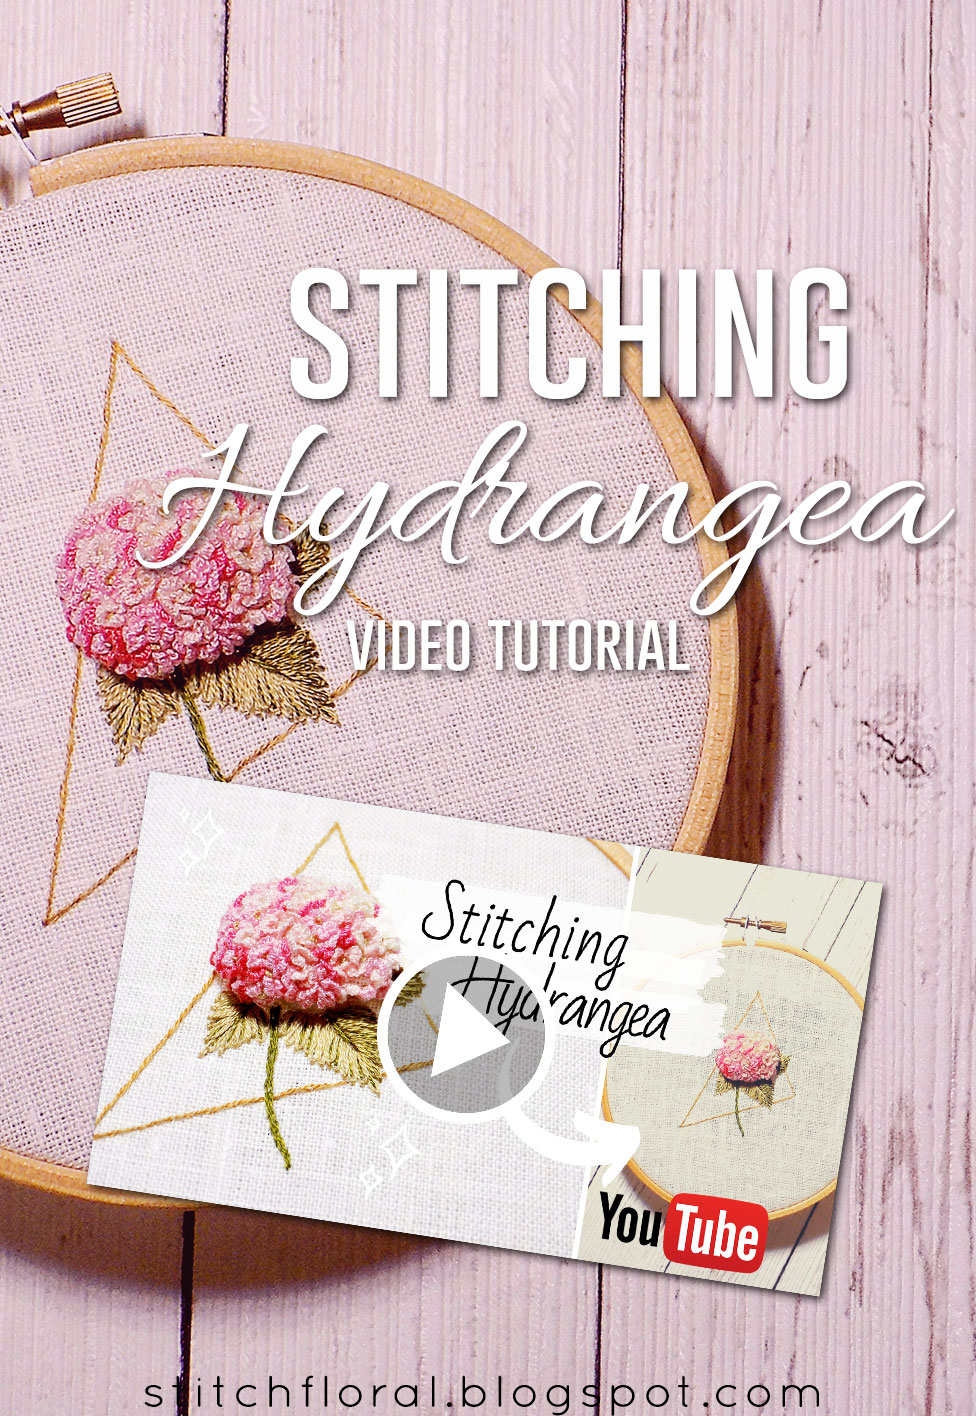 Stitching Hydrangea Dimensional Embroidery Tutorial Stitch Floral